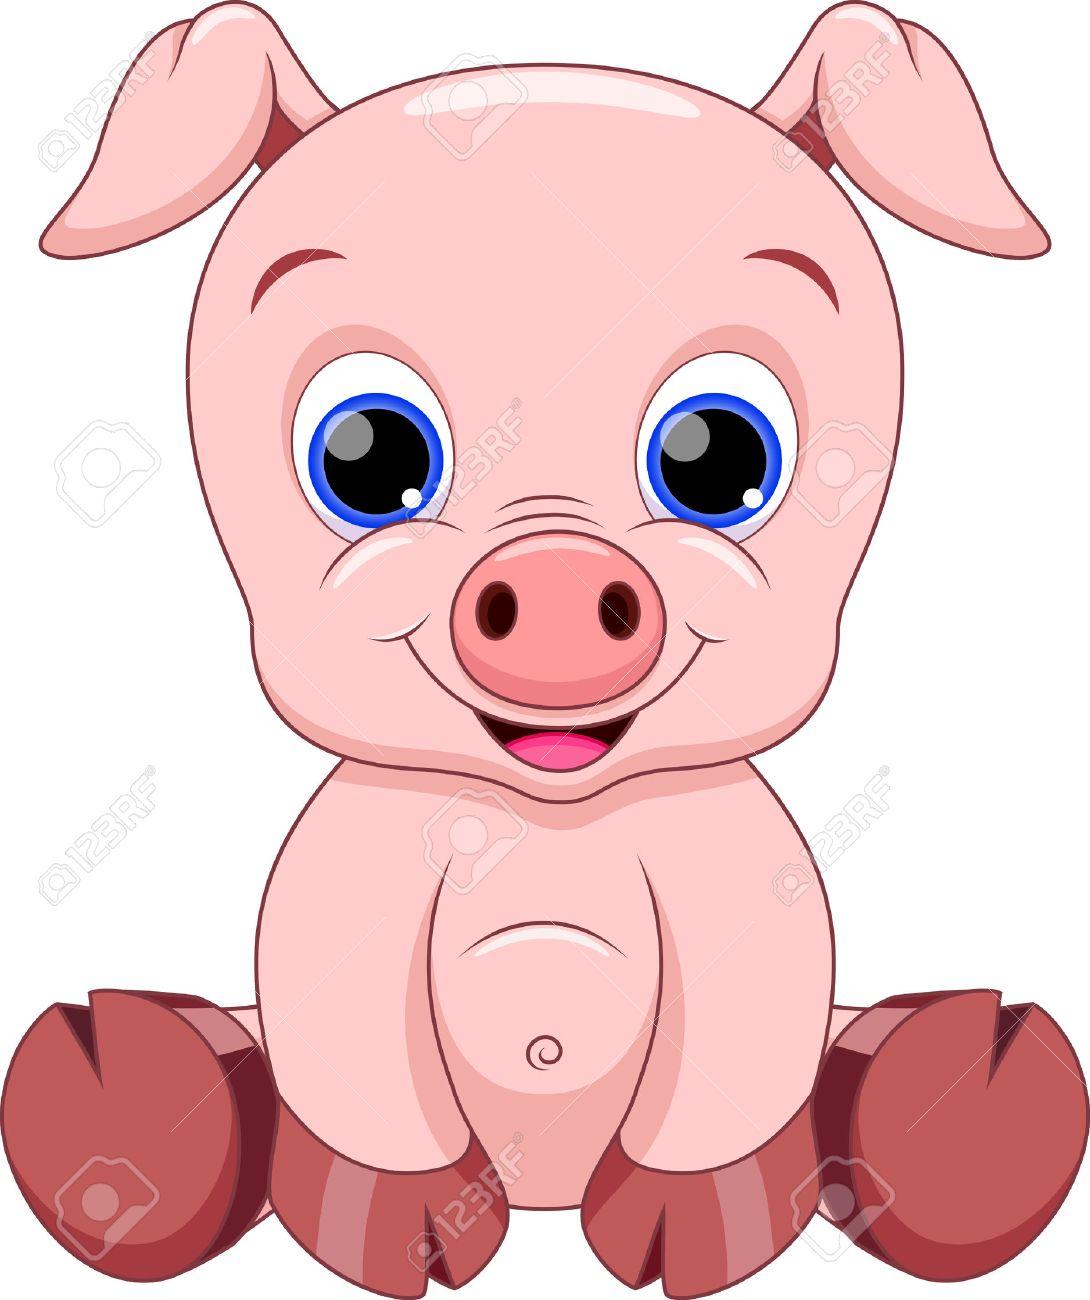 Cochon Dessin mignon dessin animé bébé cochon clip art libres de droits , vecteurs